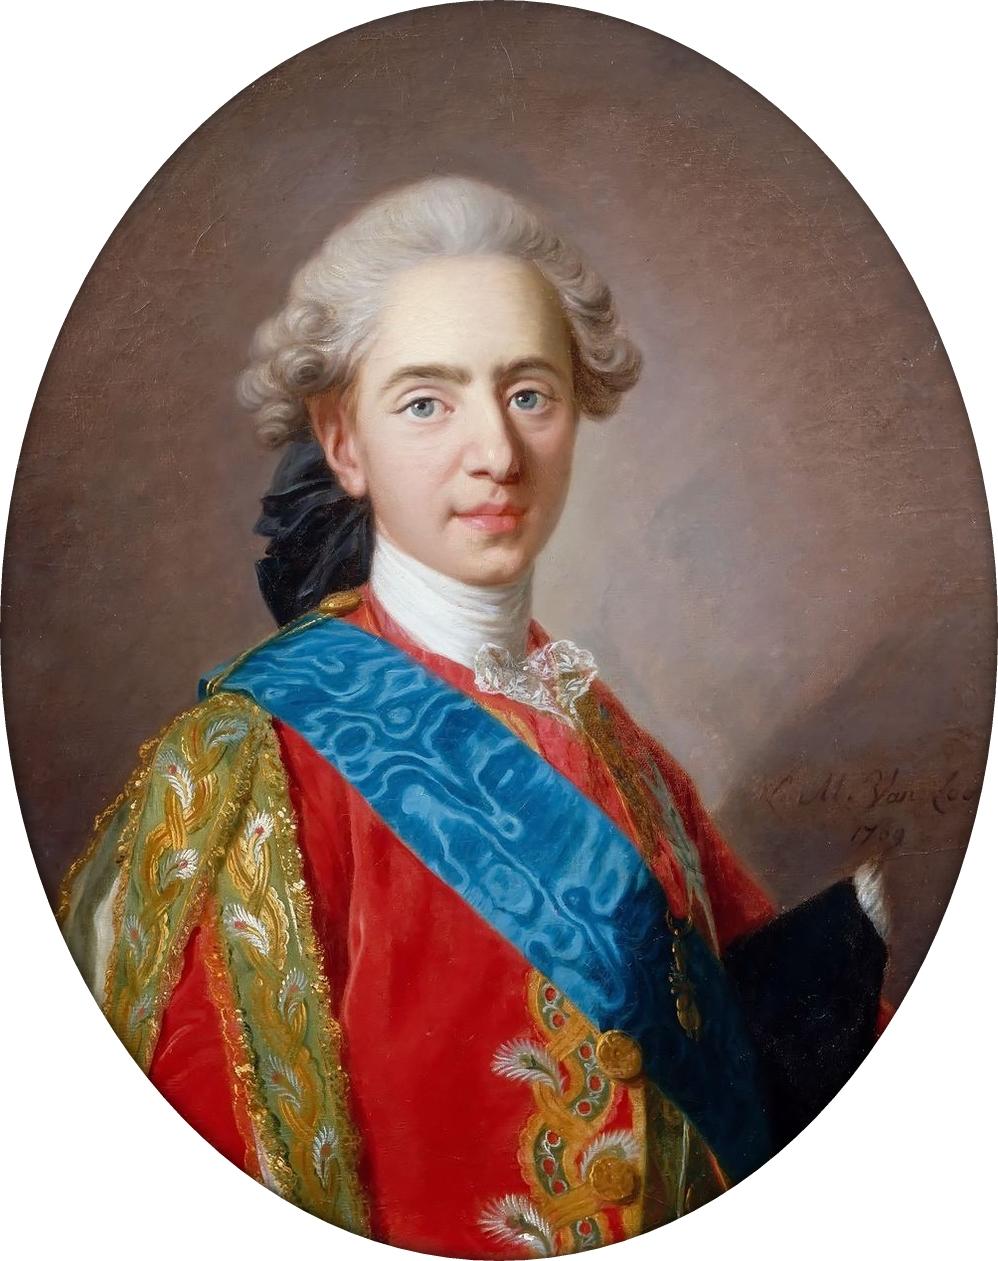 Fichier:Van Loo, Louis-Michel - The Dauphin Louis Auguste, later Louis XVI.jpg  — Wikipédia